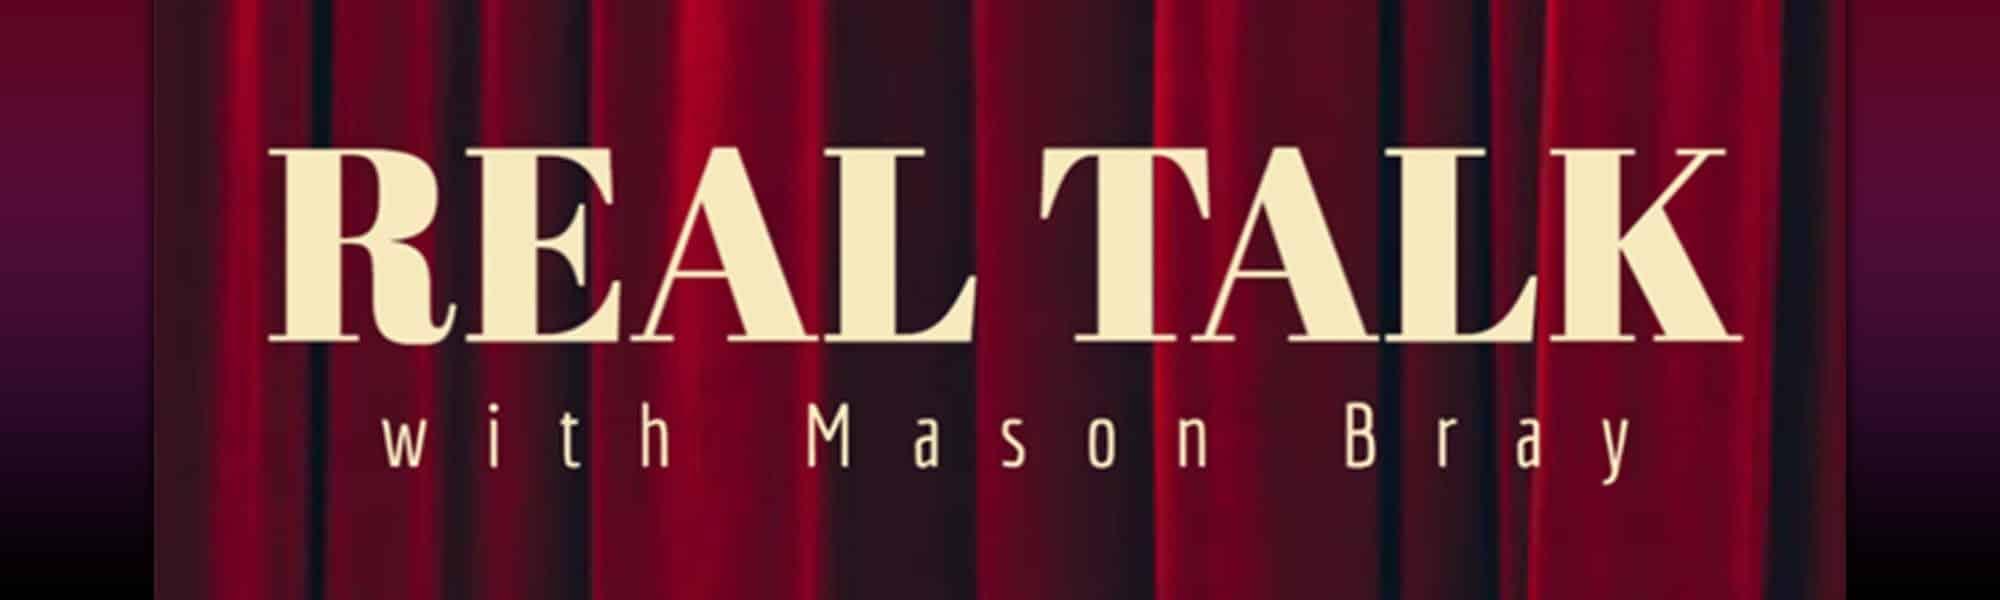 Real Talk With Mason Bray - banner